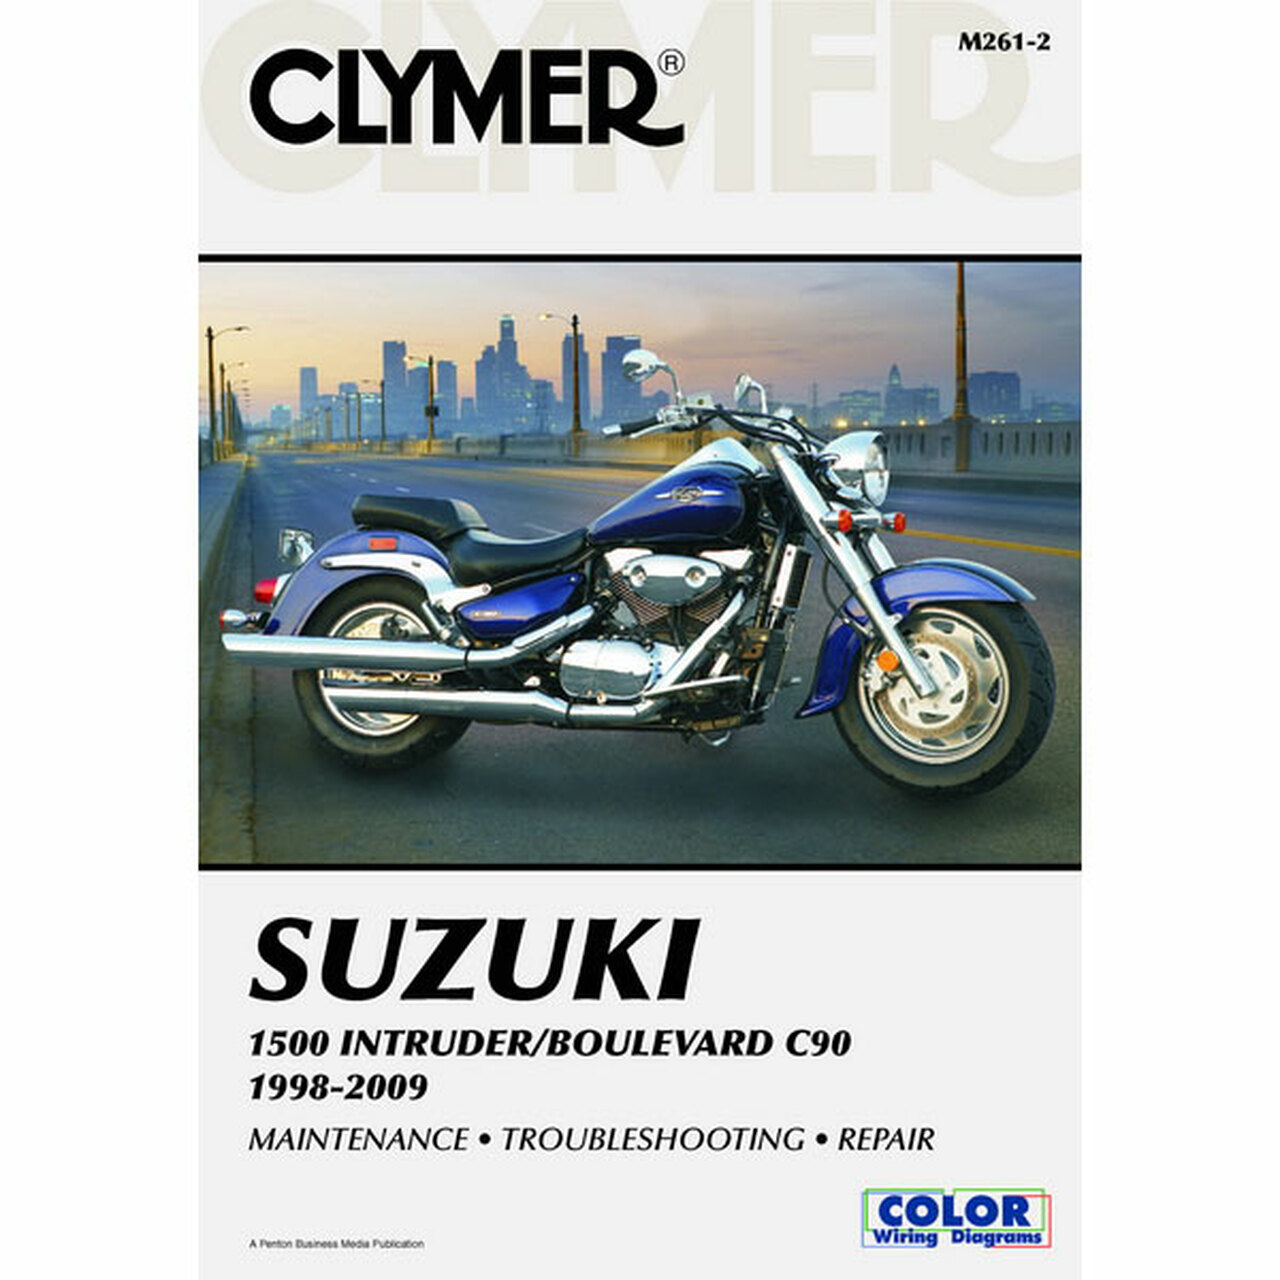 small resolution of clymer suzuki 1500 intruder boulevard c90 98 09 service manual sportbike track gear